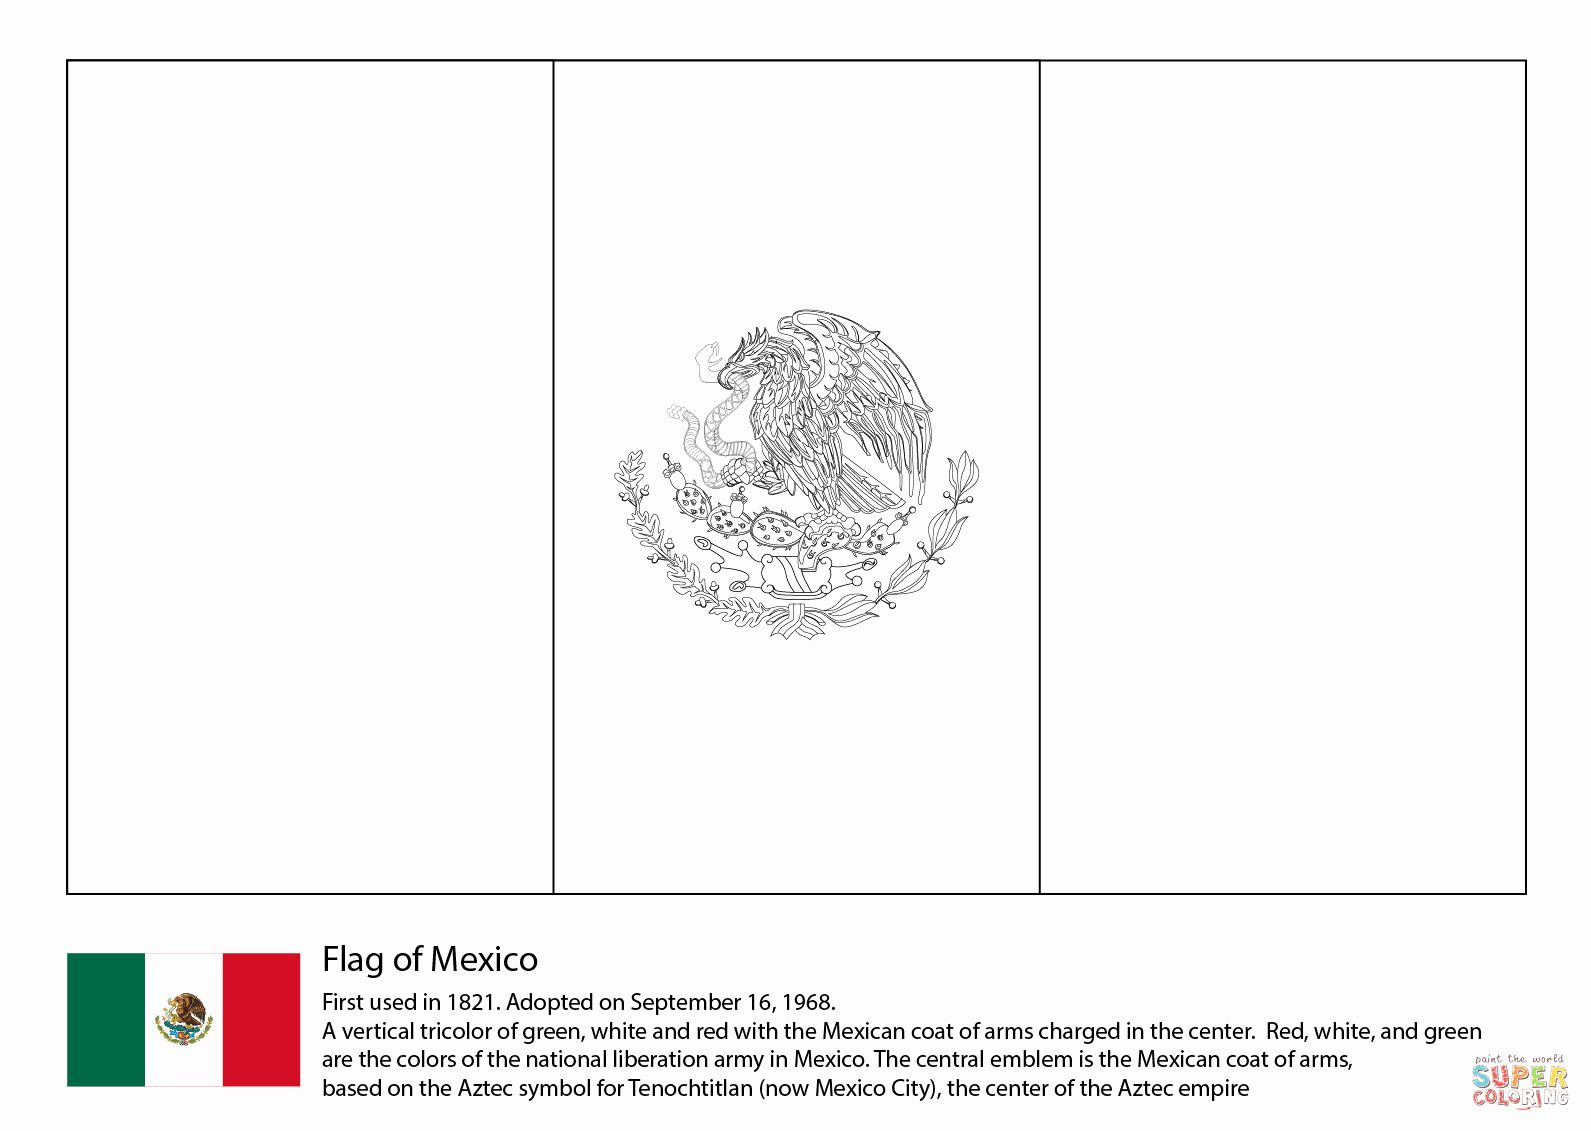 Mexico Flag Coloring Sheet Luxury Mexico Coloring Pages Printable Az Coloring Pages In 2020 Flag Coloring Pages Flag Printable Mexican Flags